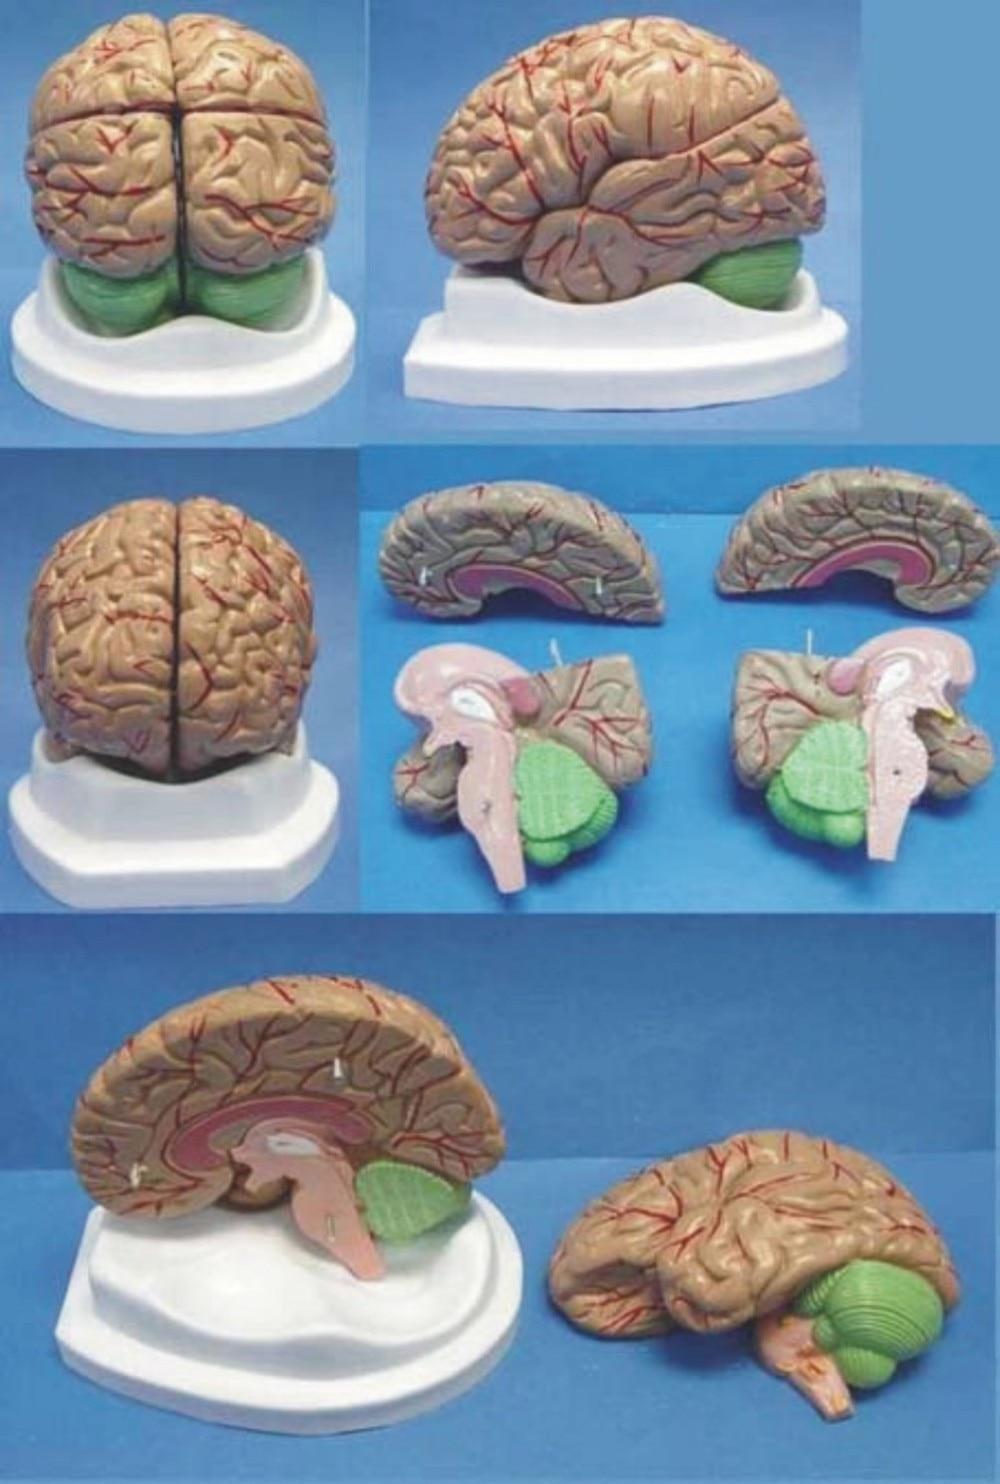 Brain anatomy Organ anatomical model Medical Human specimens free ...